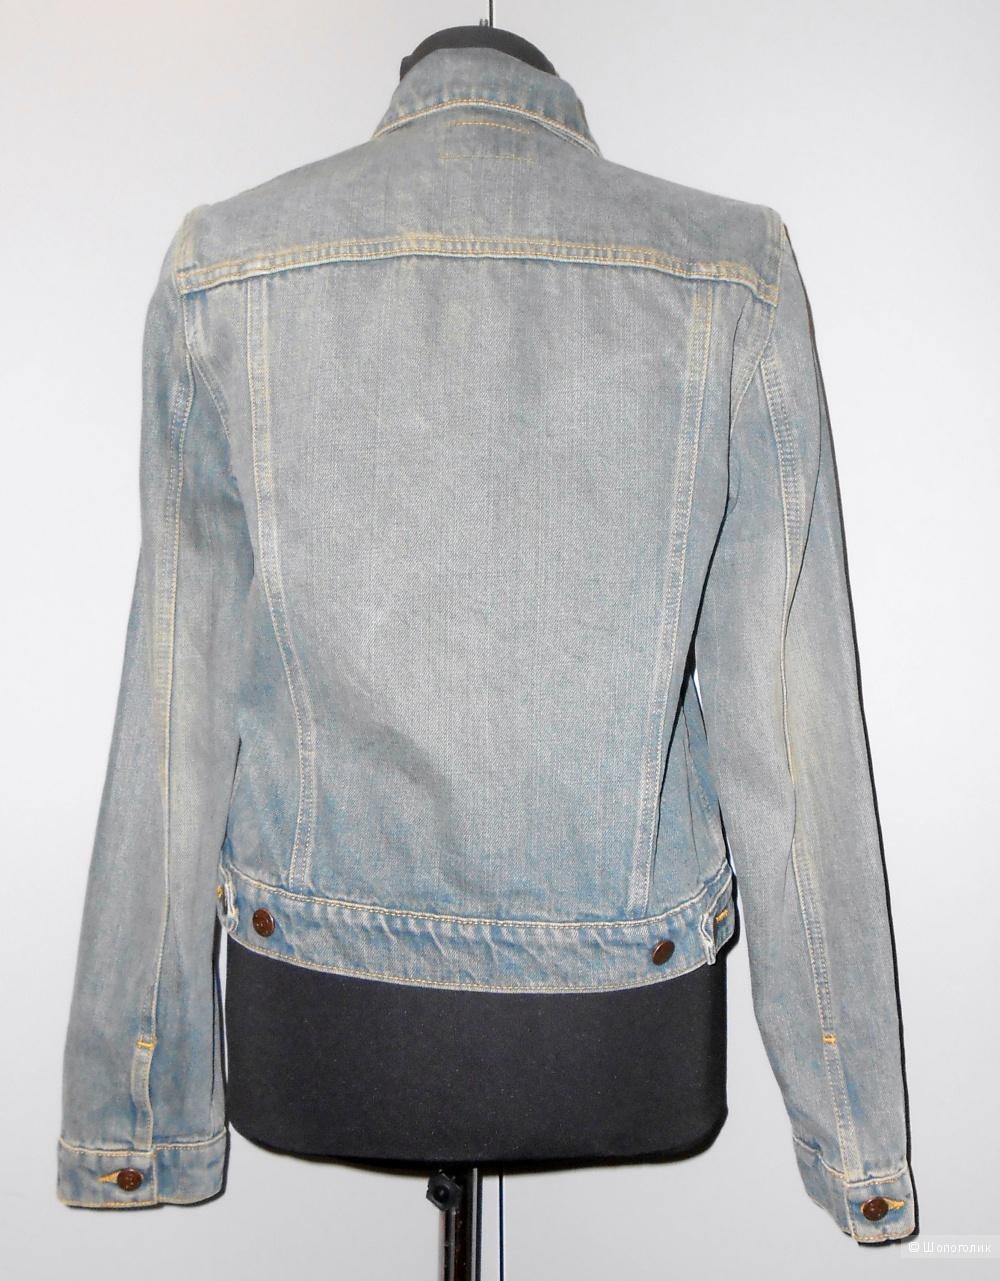 Джинсовая куртка Polo Ralph Lauren, размер M